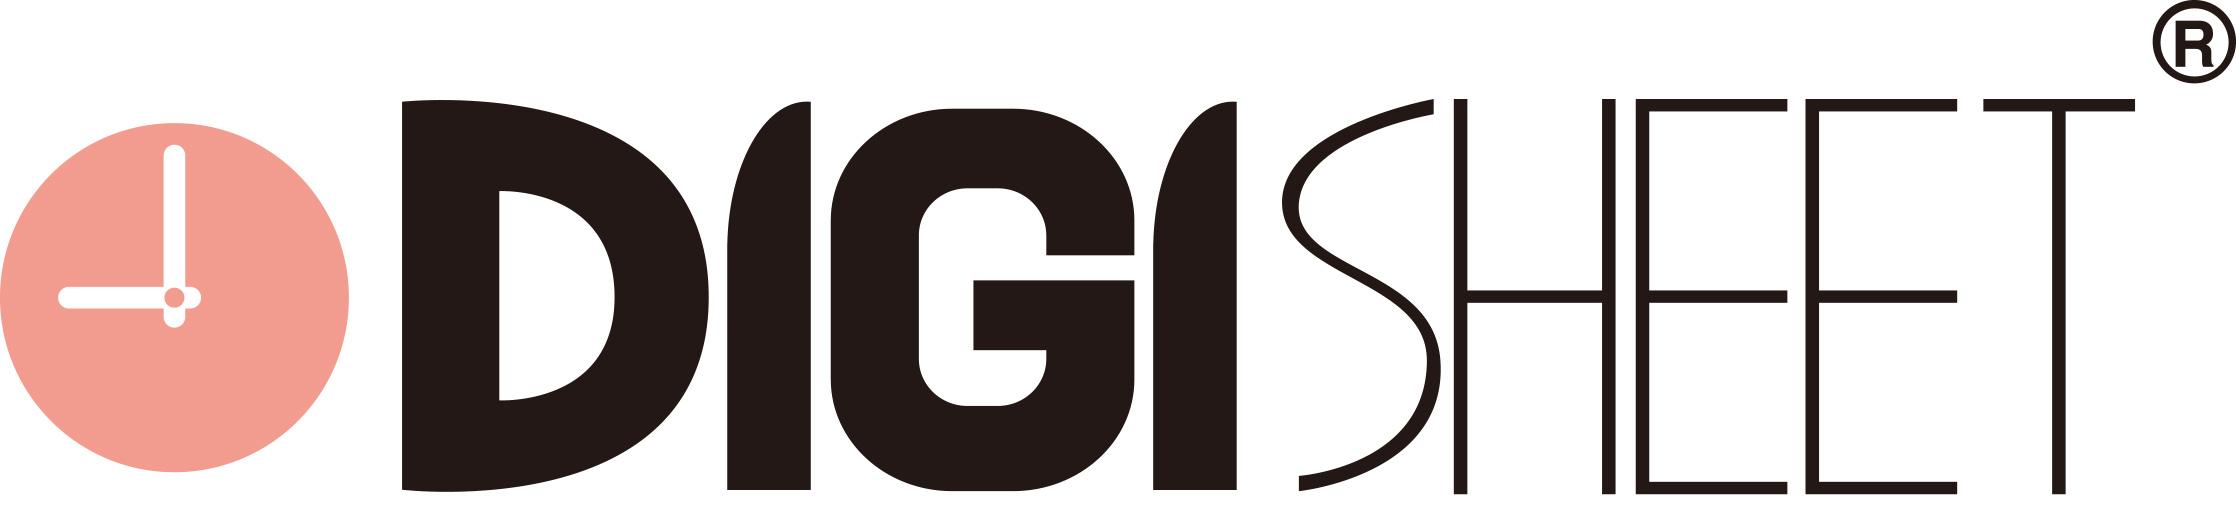 DigiSheet(デジシート)|人材派遣業向け勤怠管理システム